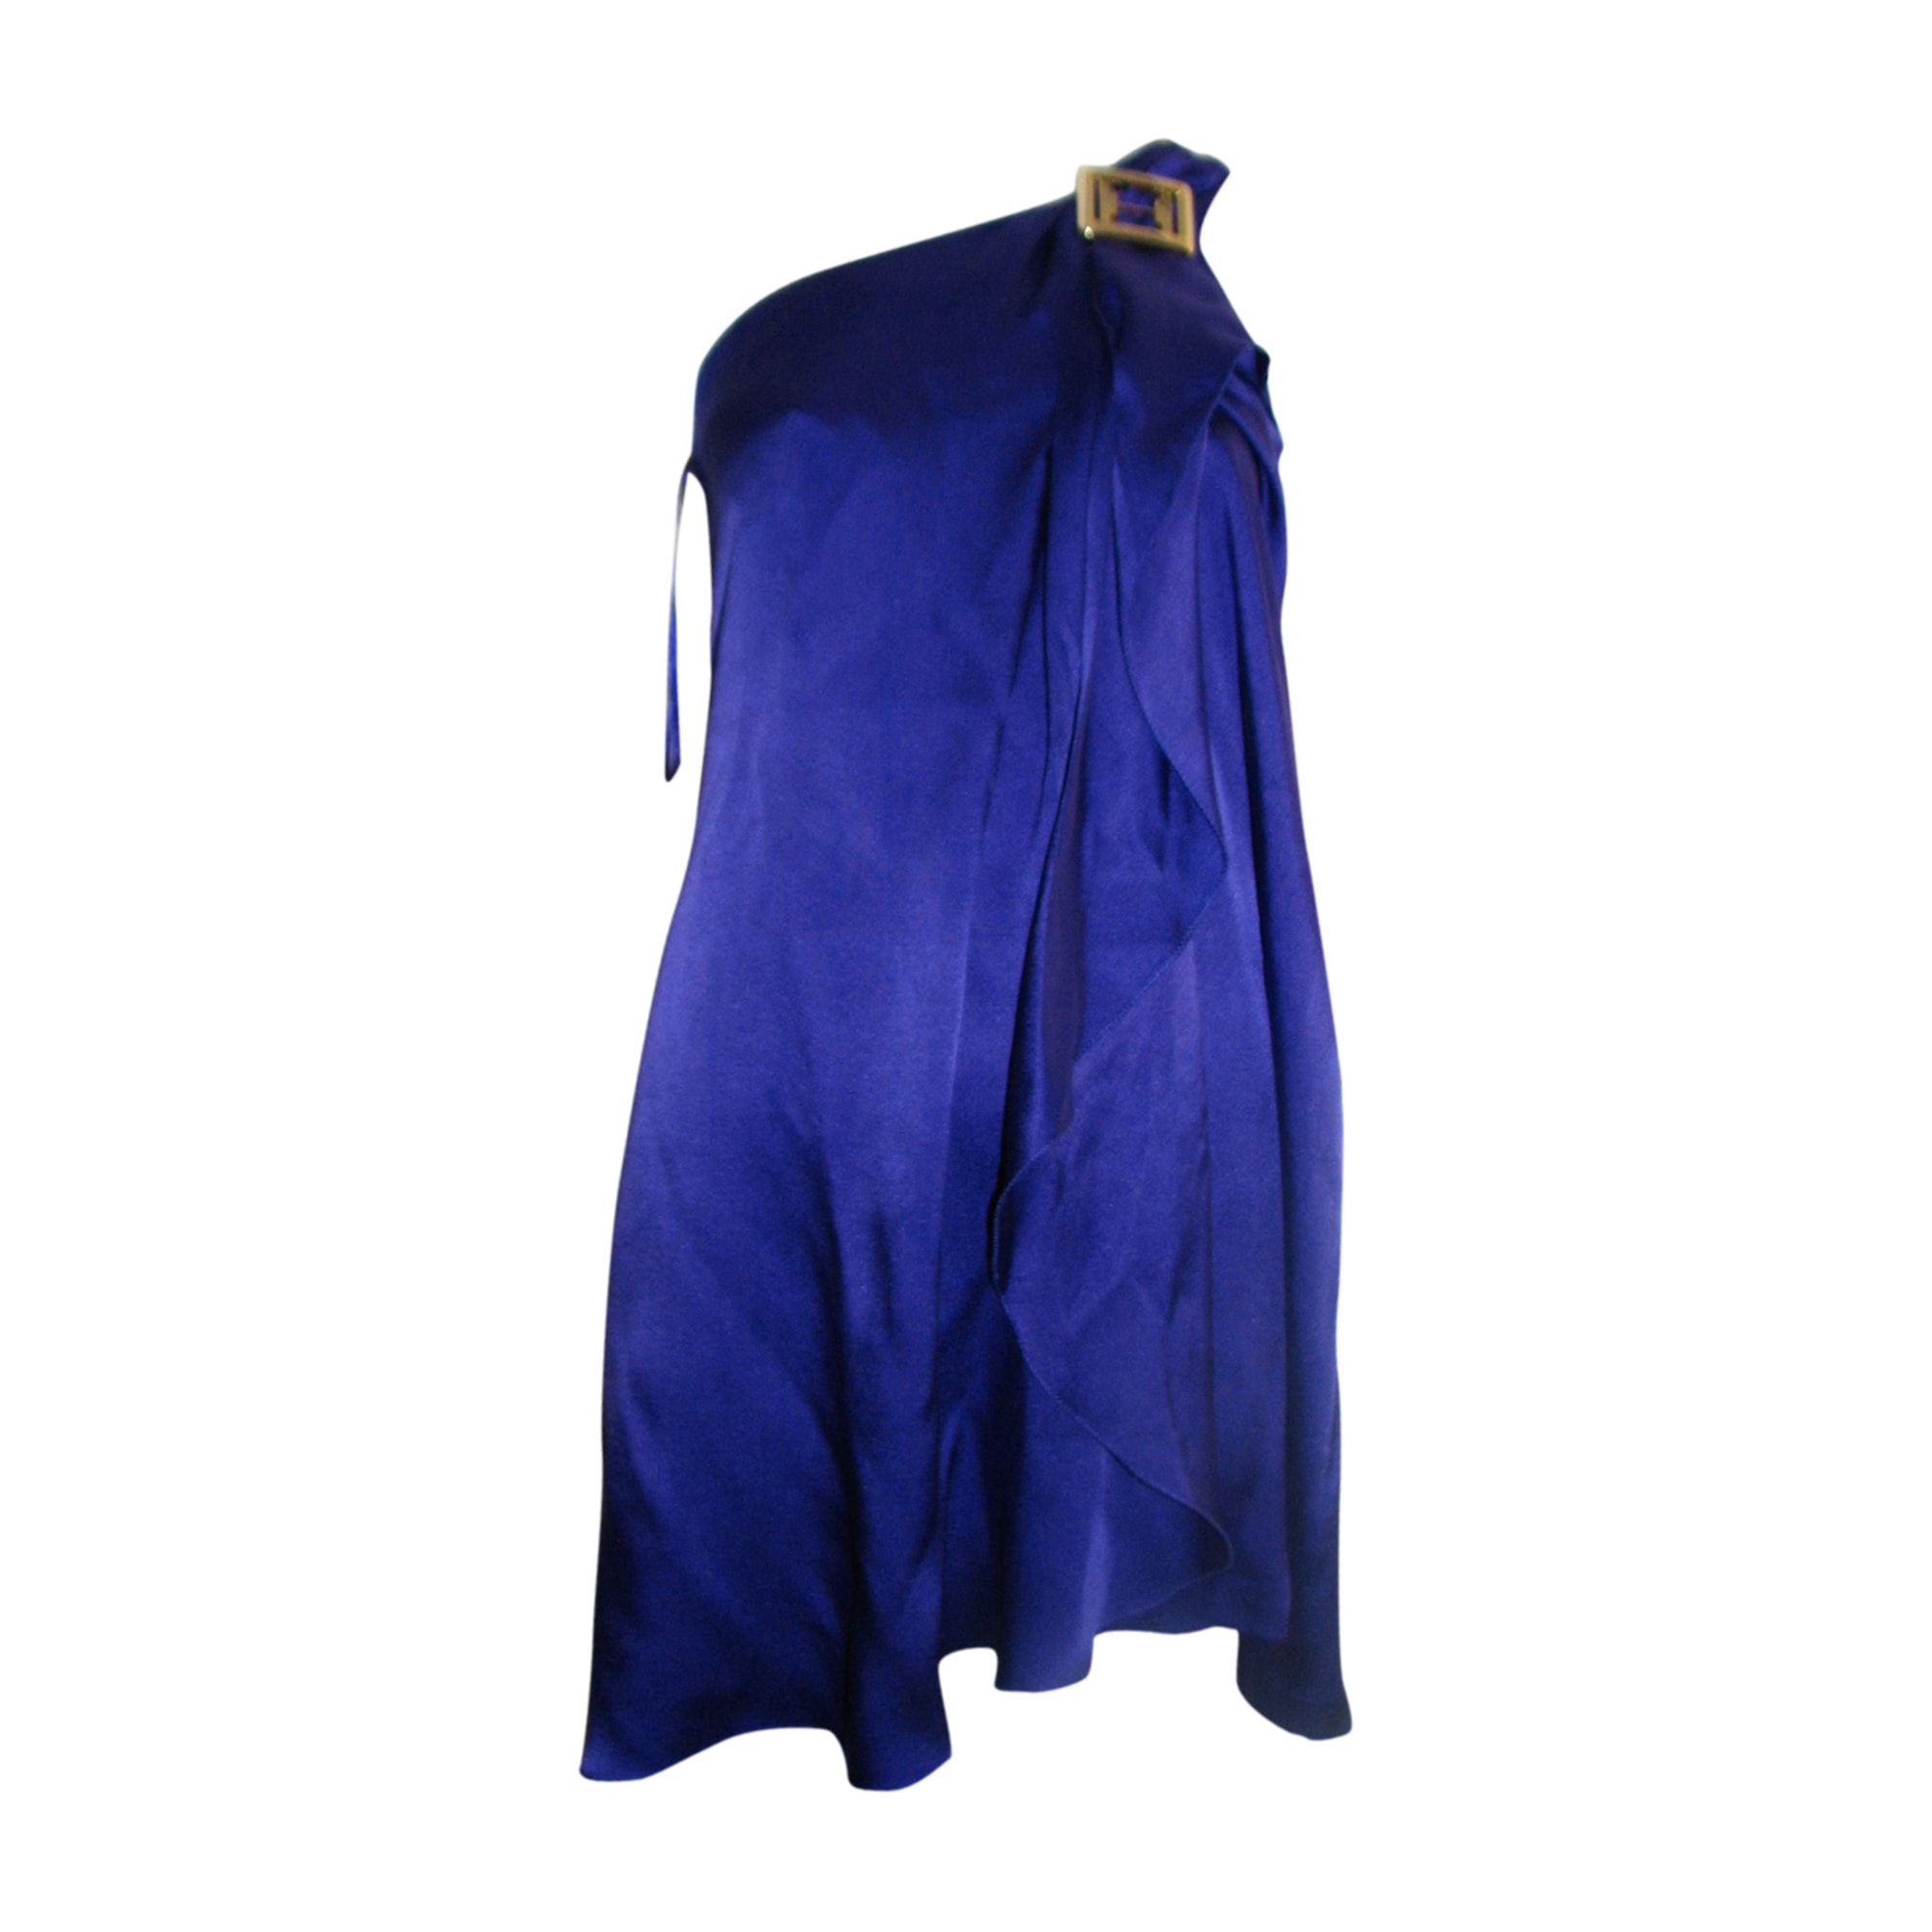 Robe courte HALSTON HERITAGE Violet, mauve, lavande